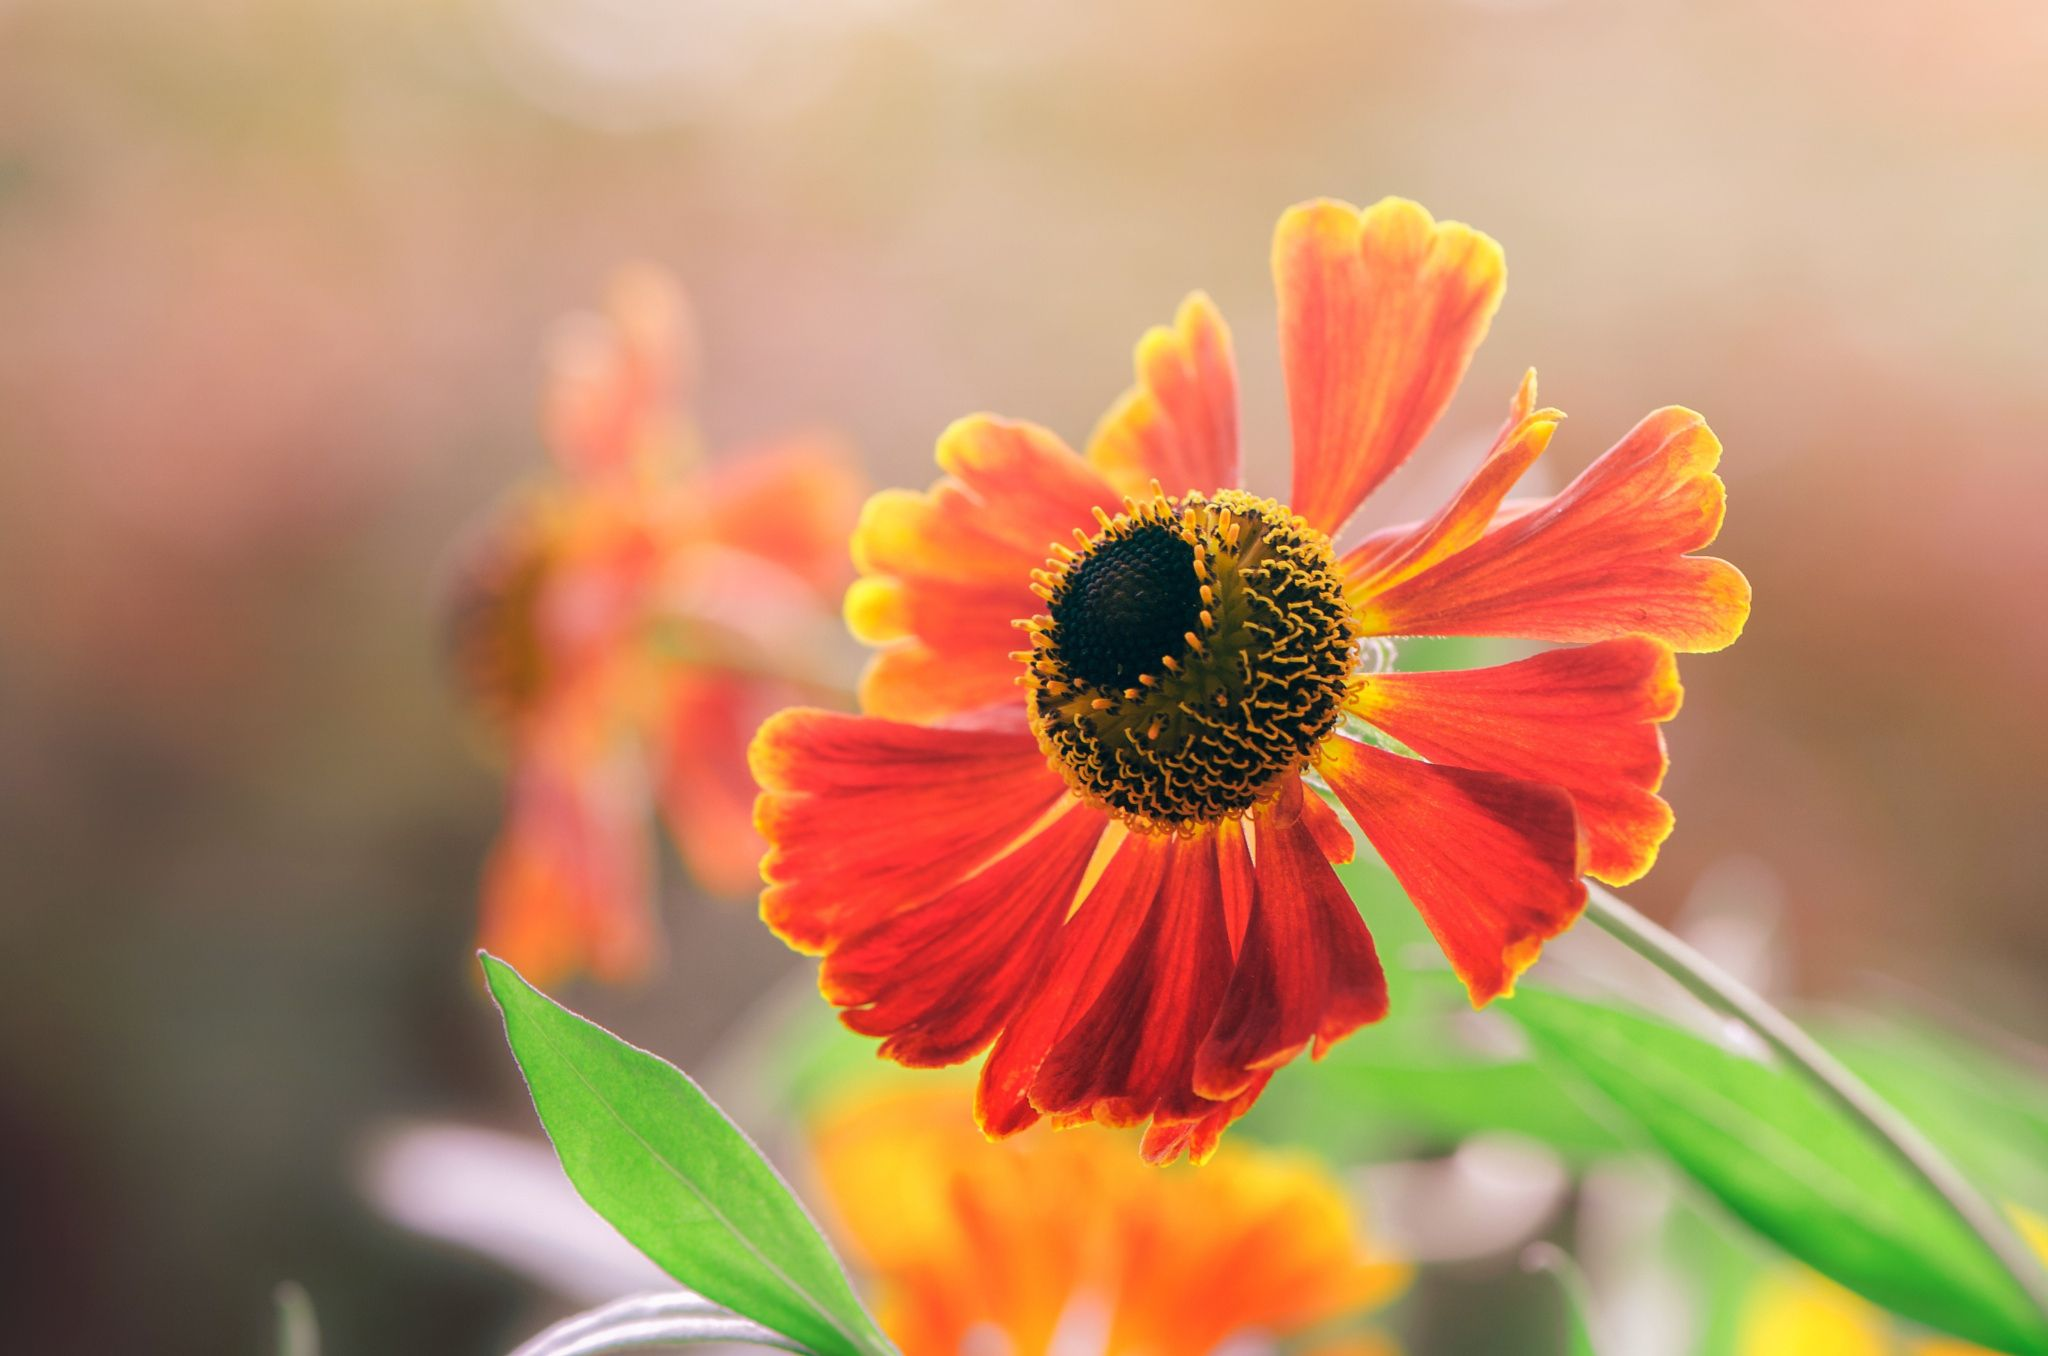 Fotografía Helenium - Moerheim Beauty por B N en 500px